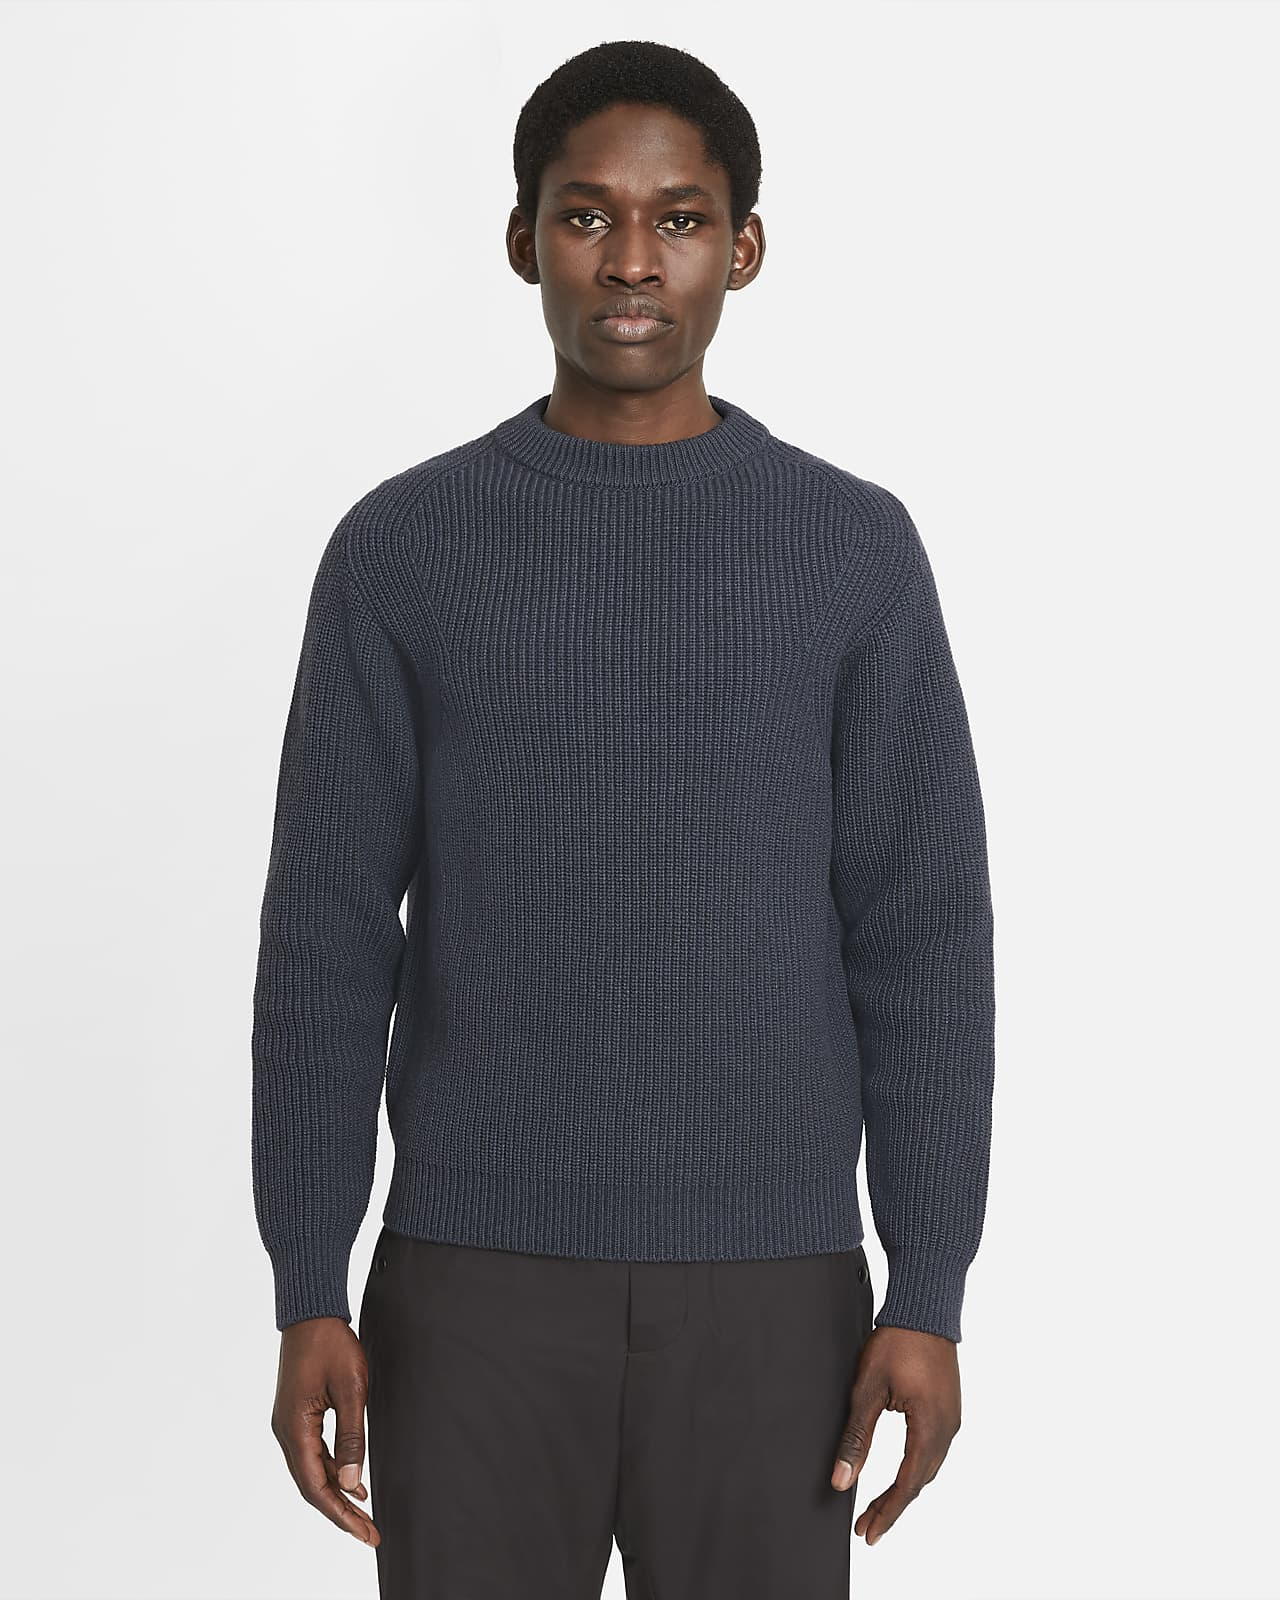 Nike ESC Men's Sweater